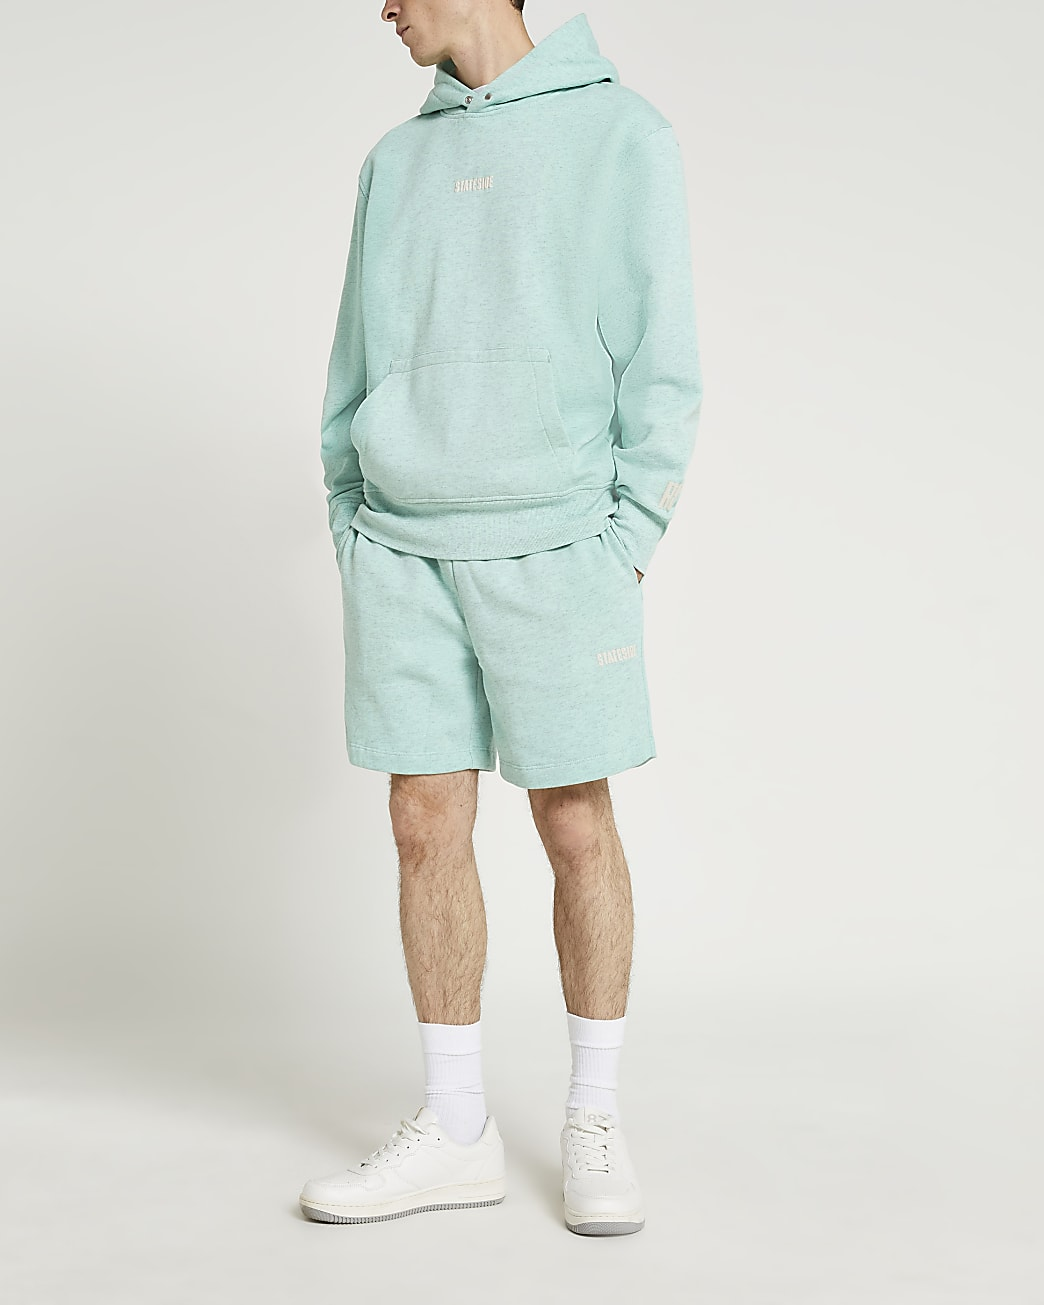 Green graphic elasticated waist shorts